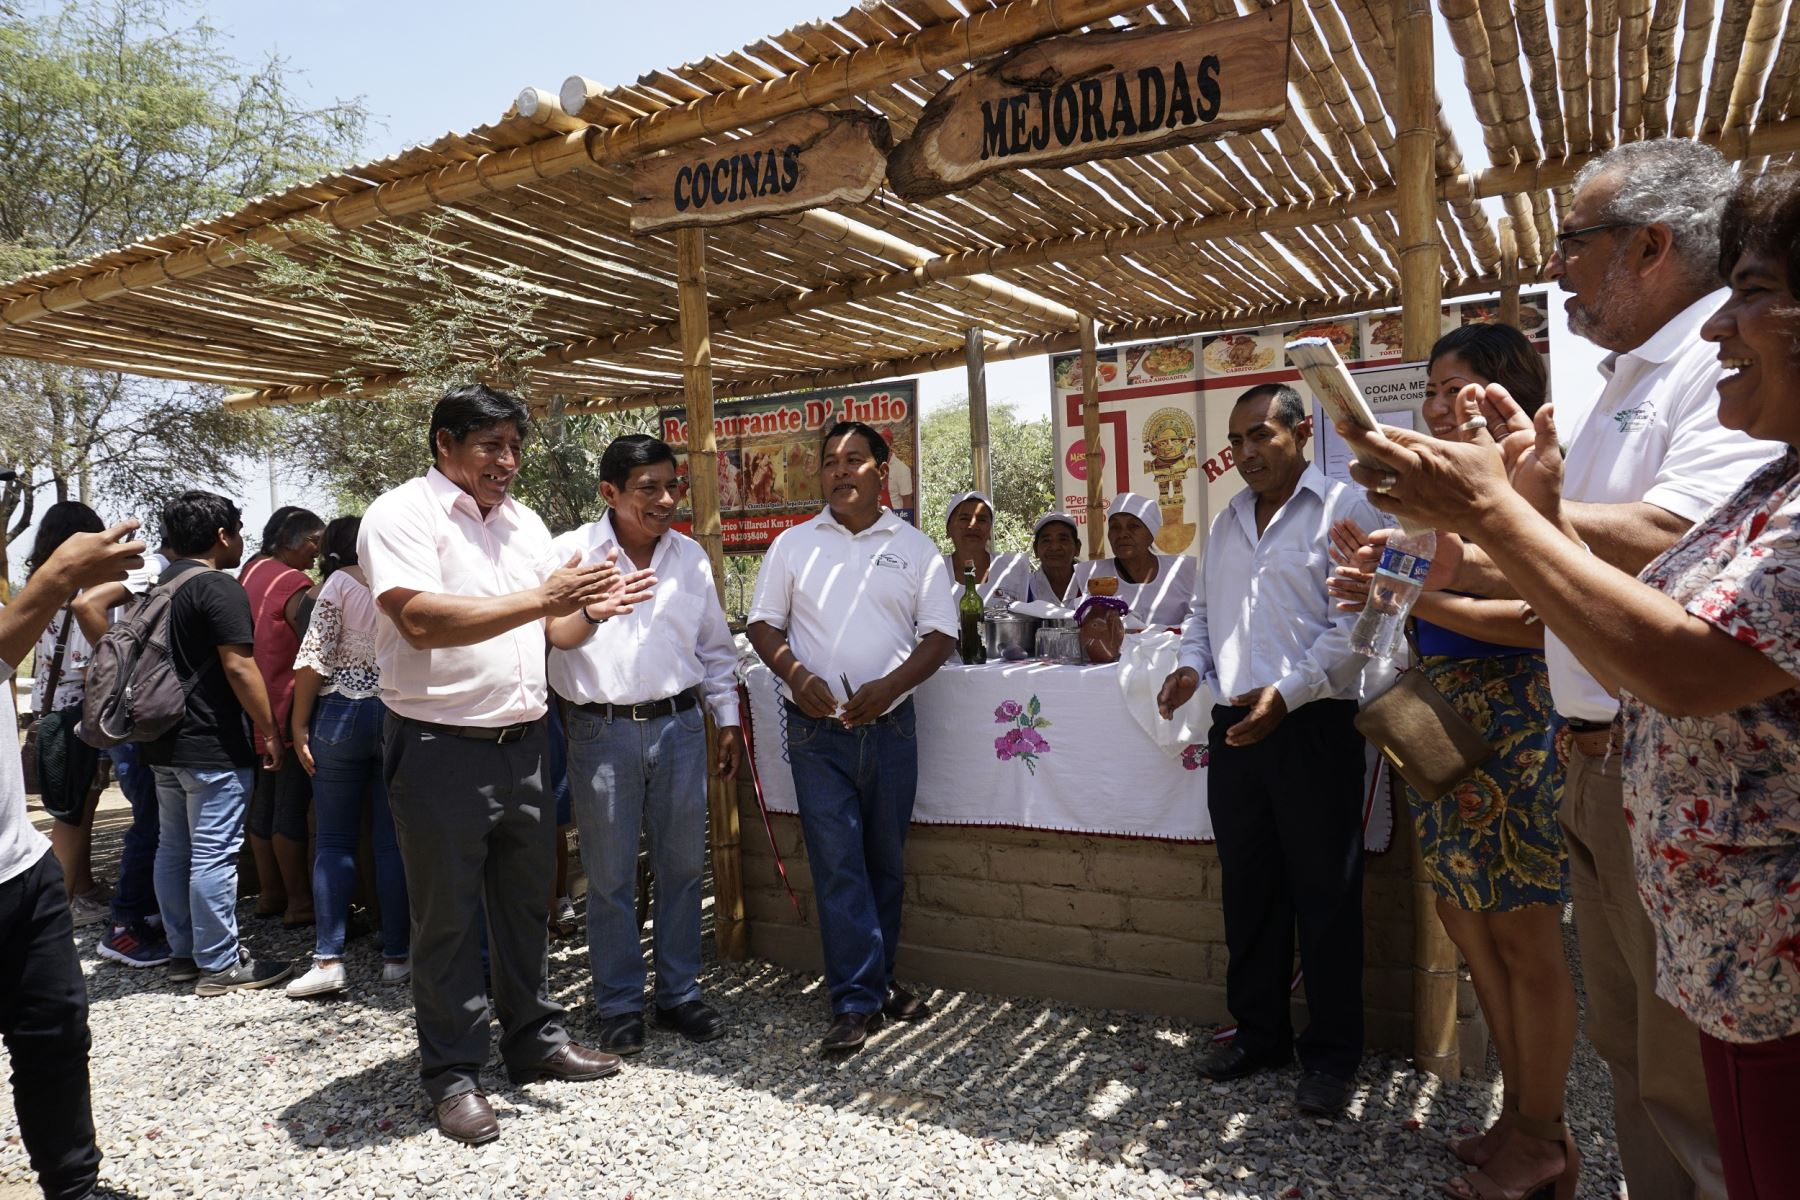 Museo de Túcume inaugura escenario para ferias gastronómicas. ANDINA